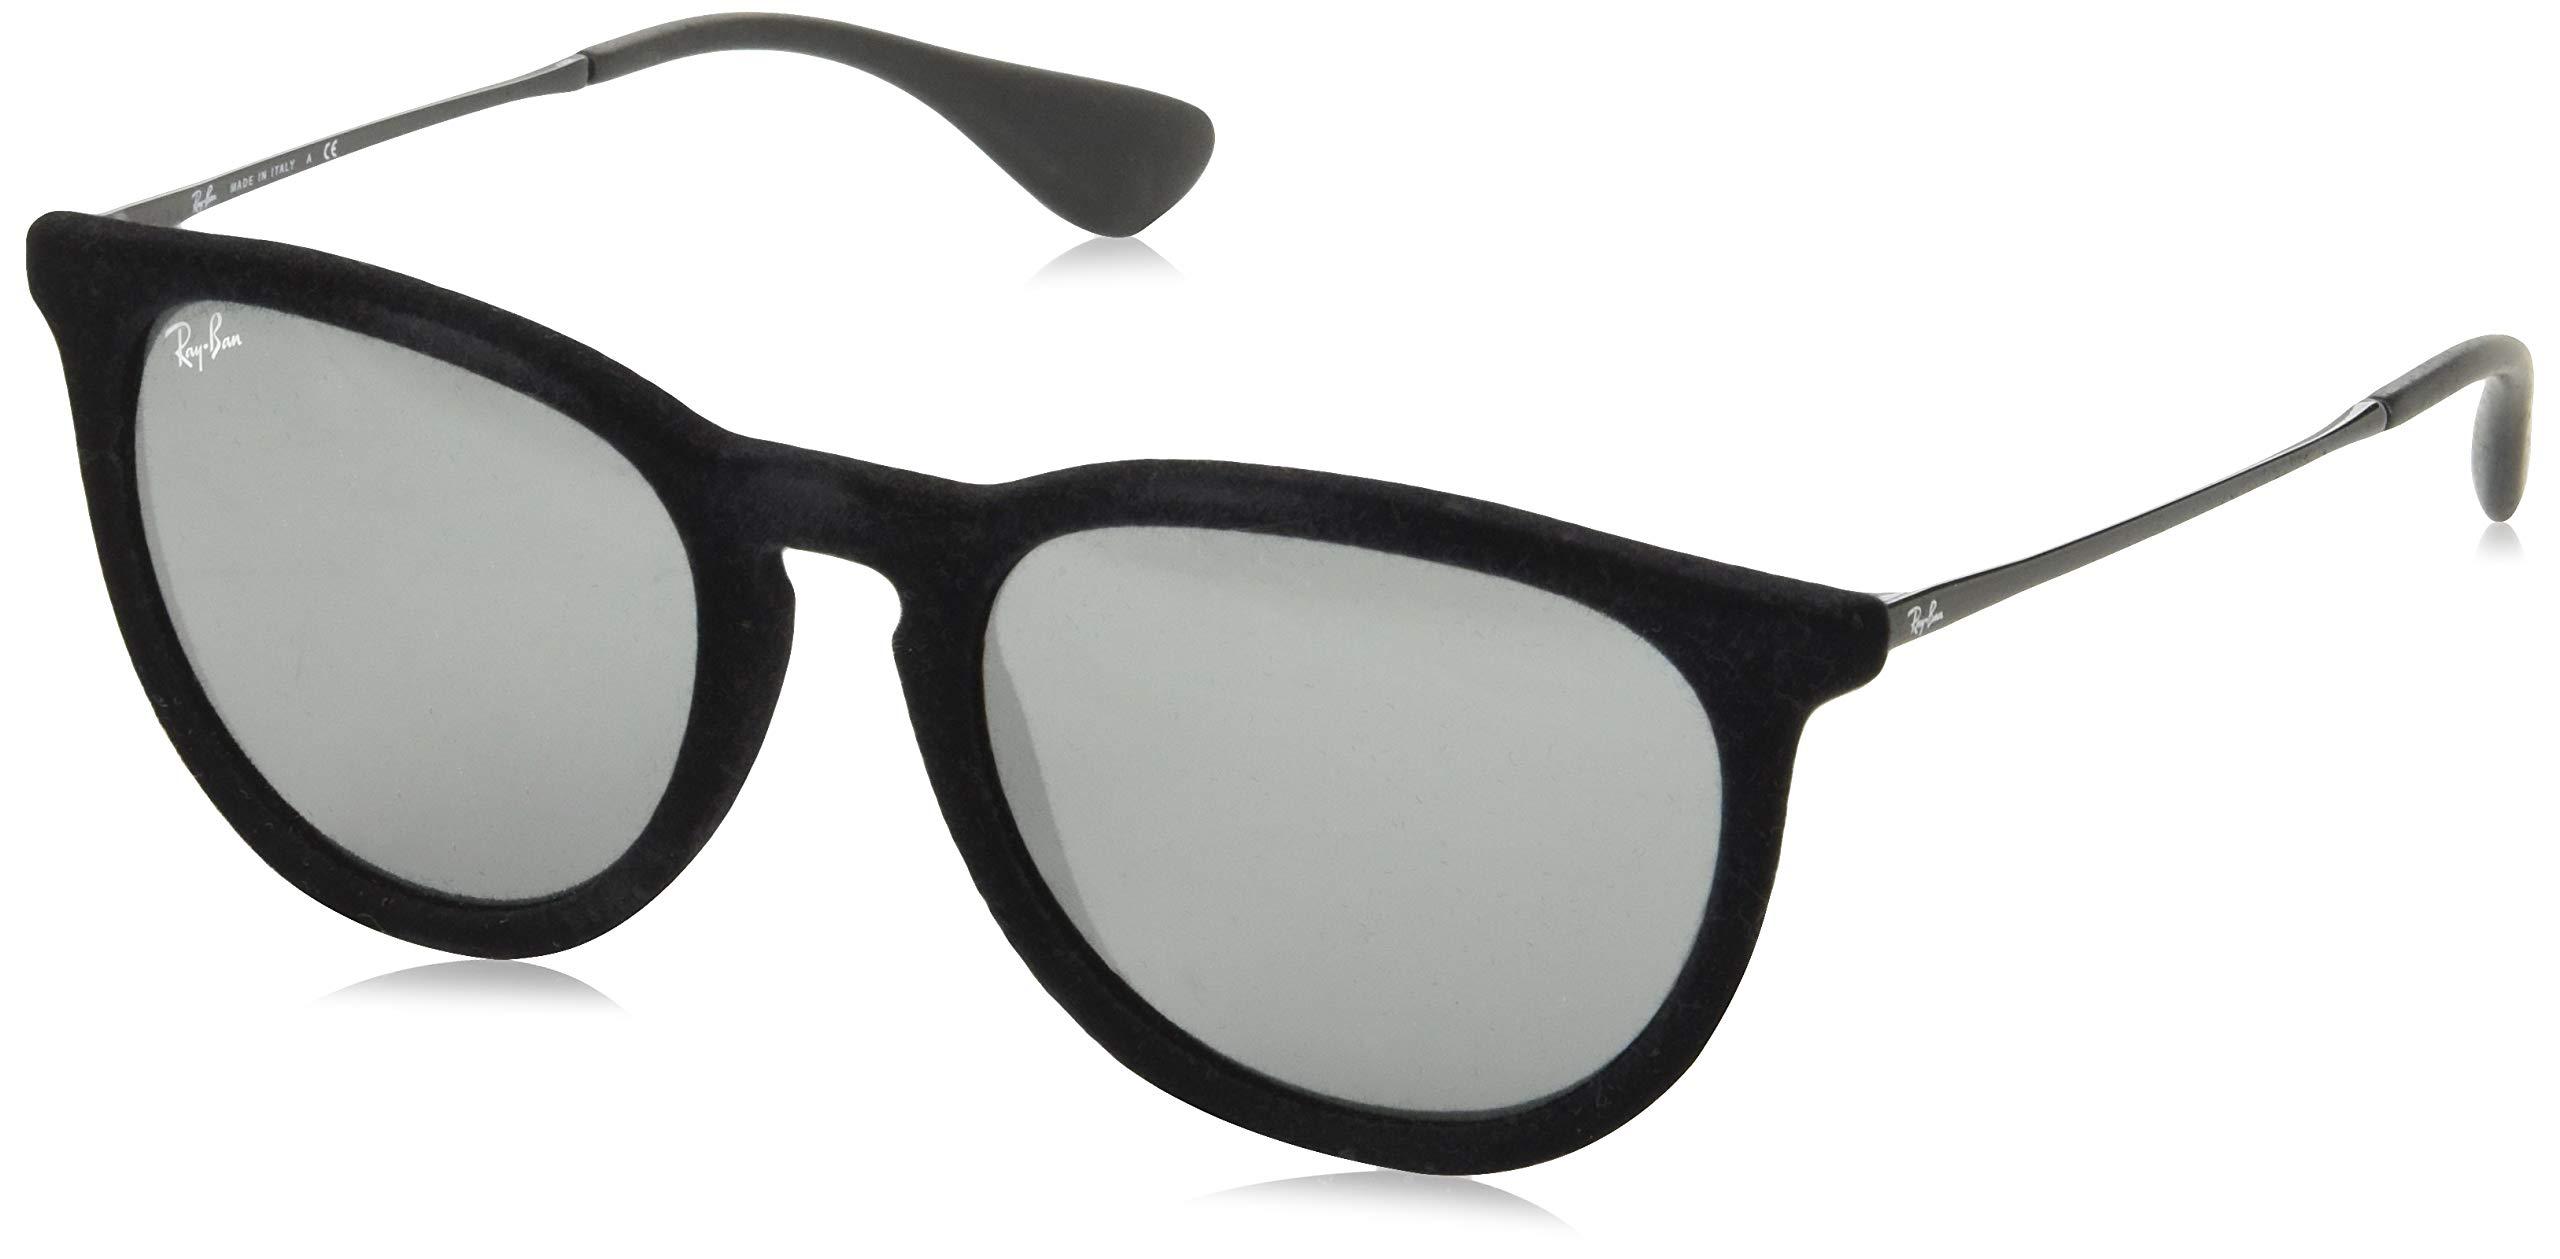 RAY-BAN RB4171 Erika Round Sunglasses, Black Velvet/Grey Mirror, by RAY-BAN